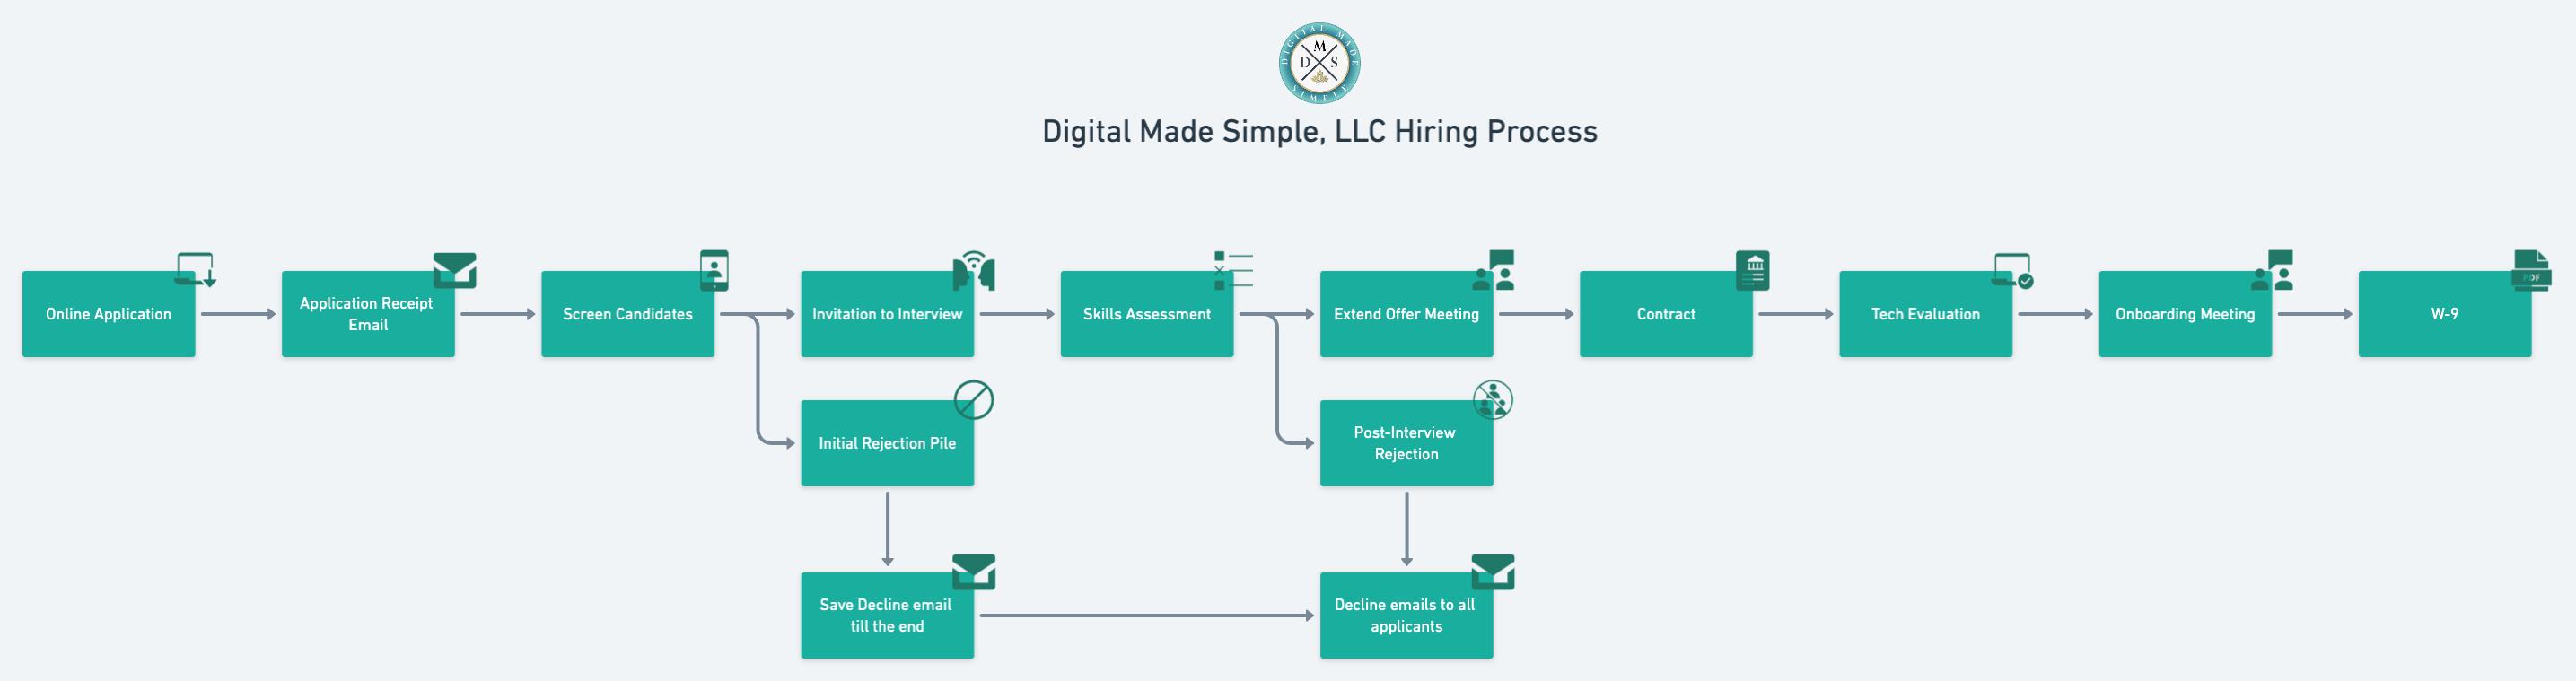 Digital Made Simple hiring process flowchart